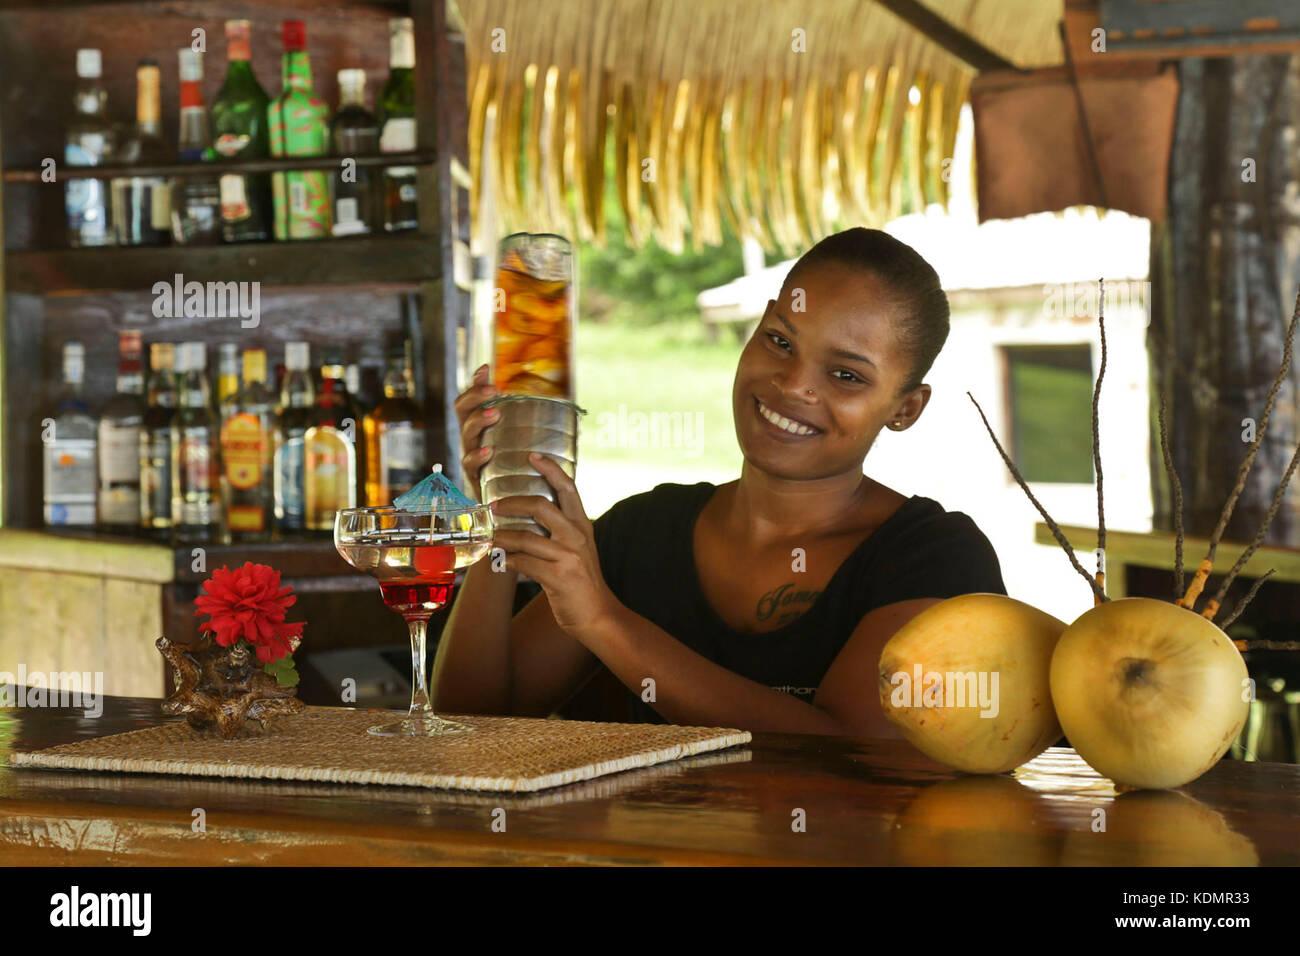 Tropical Bartender Shaking Cocktail, Caribbean - Stock Image